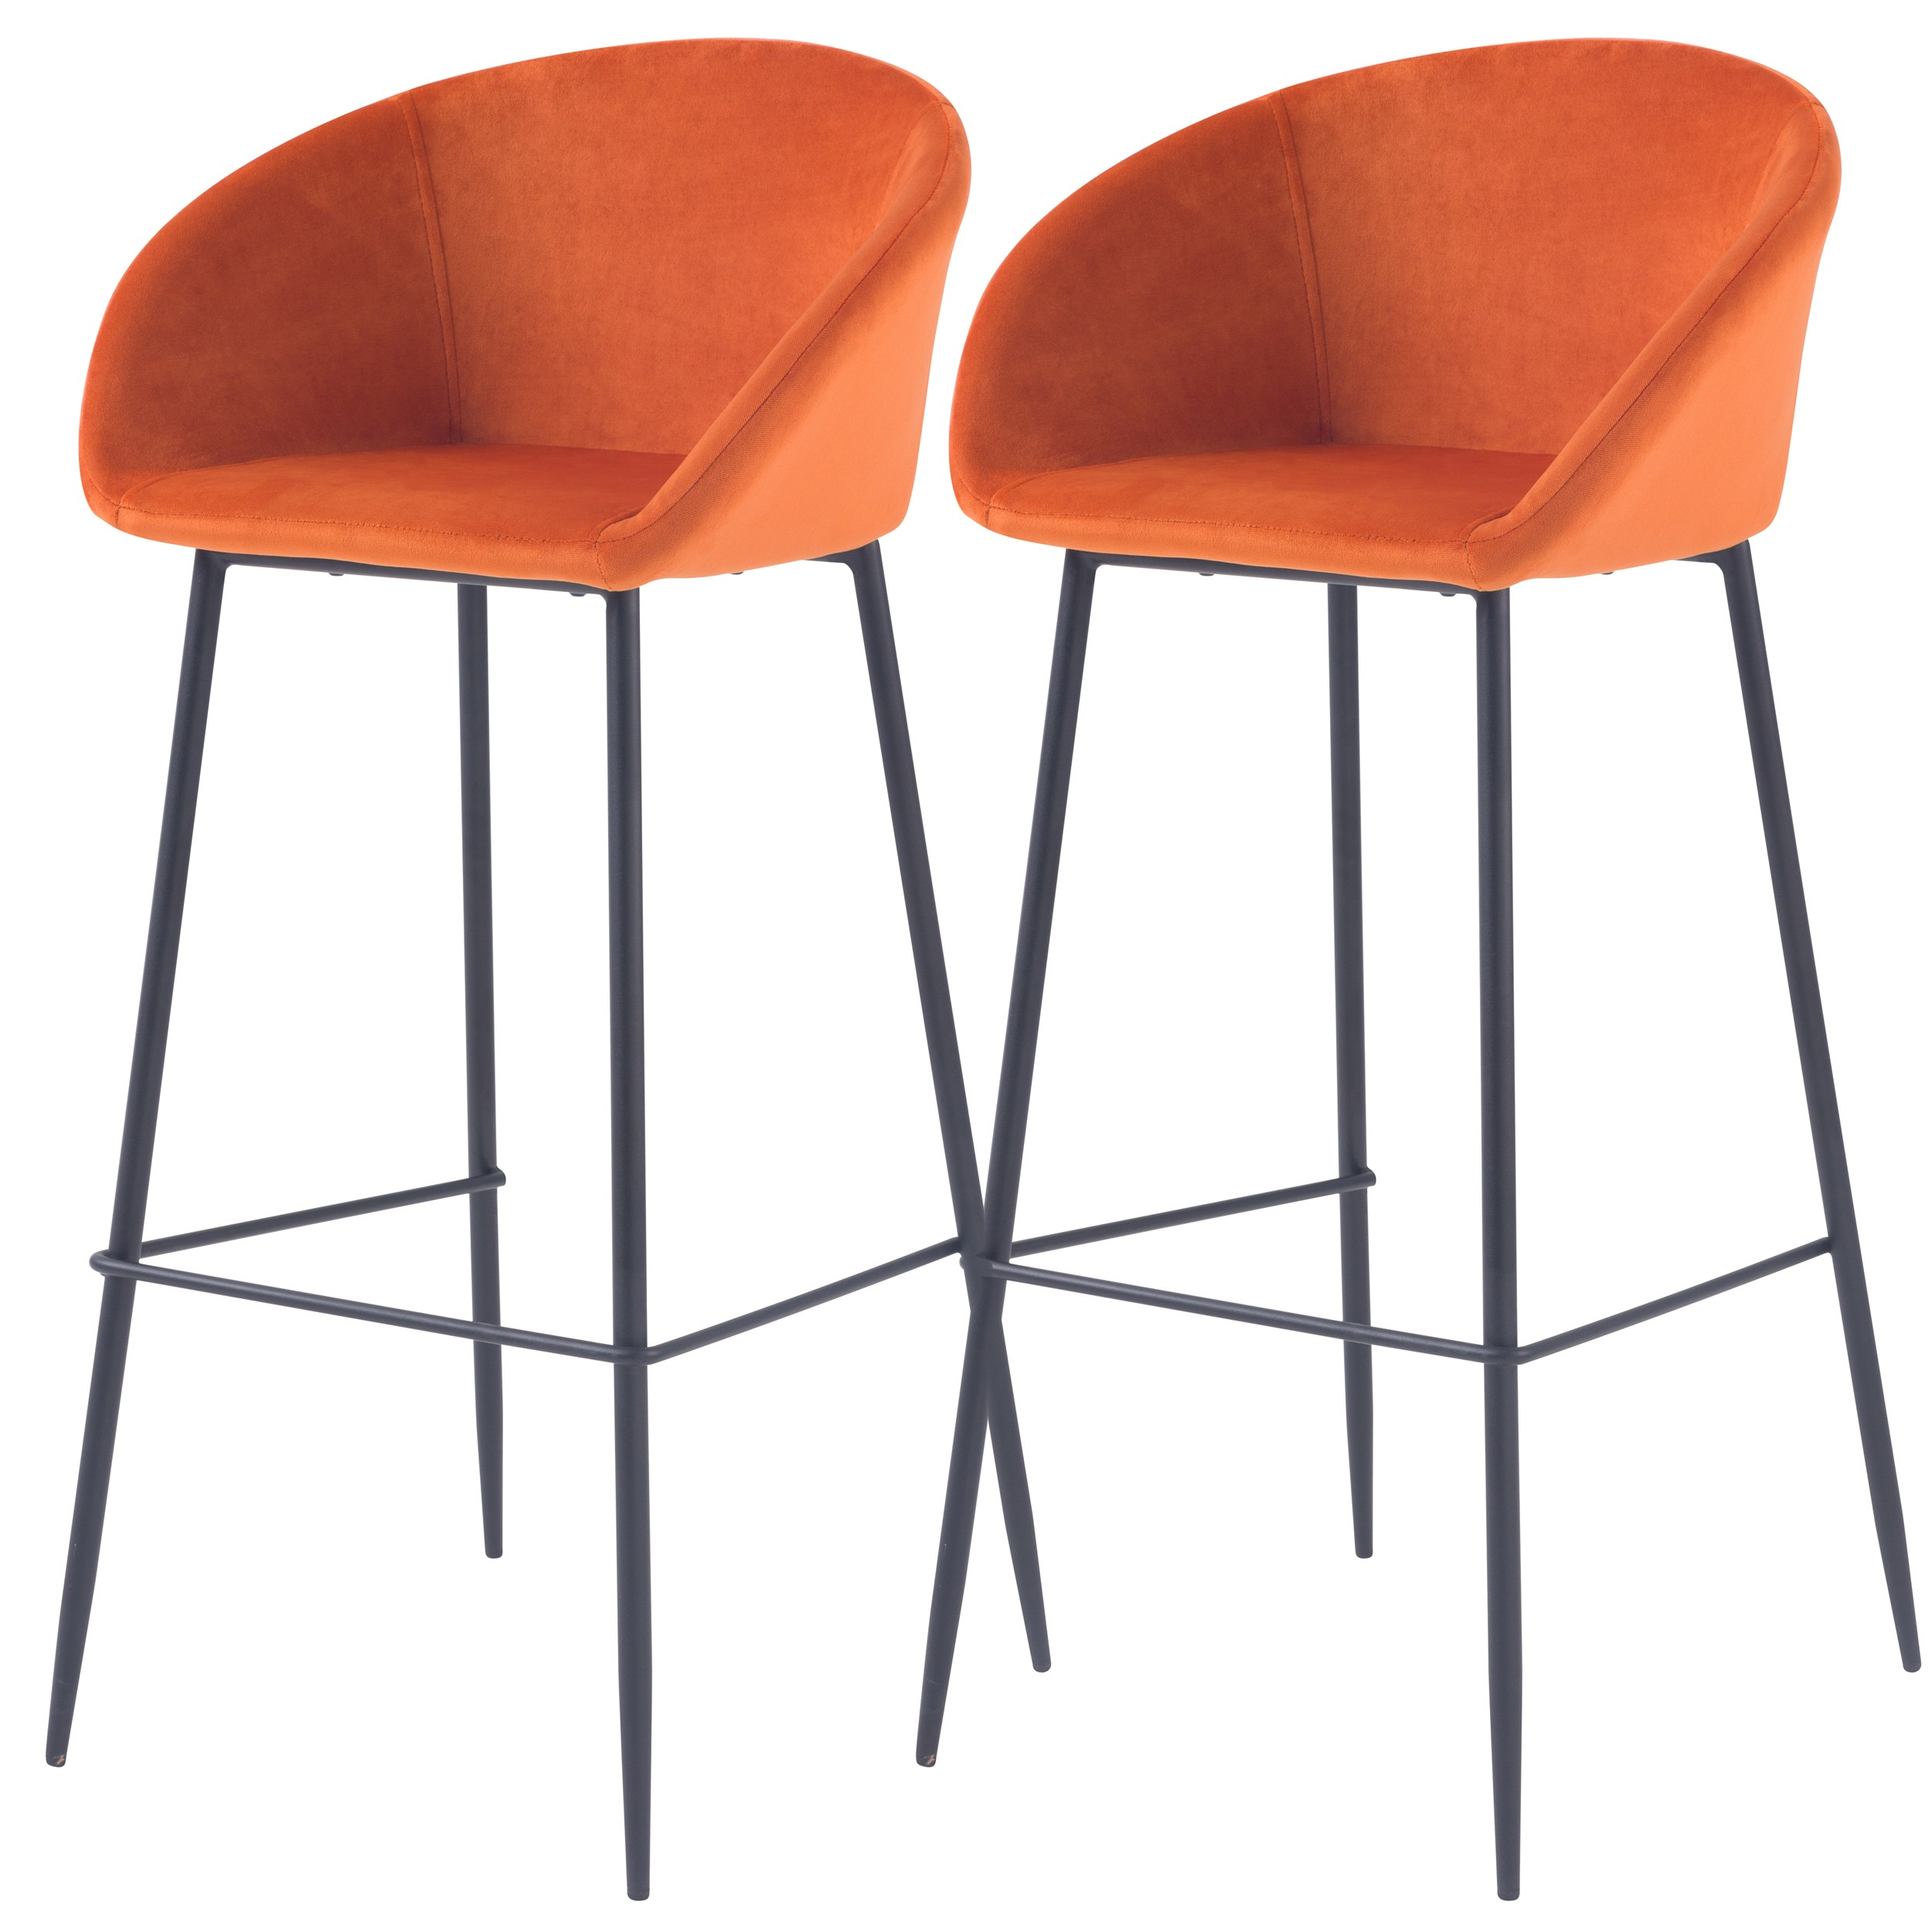 acheter chaise de bar en velours orange pieds metal